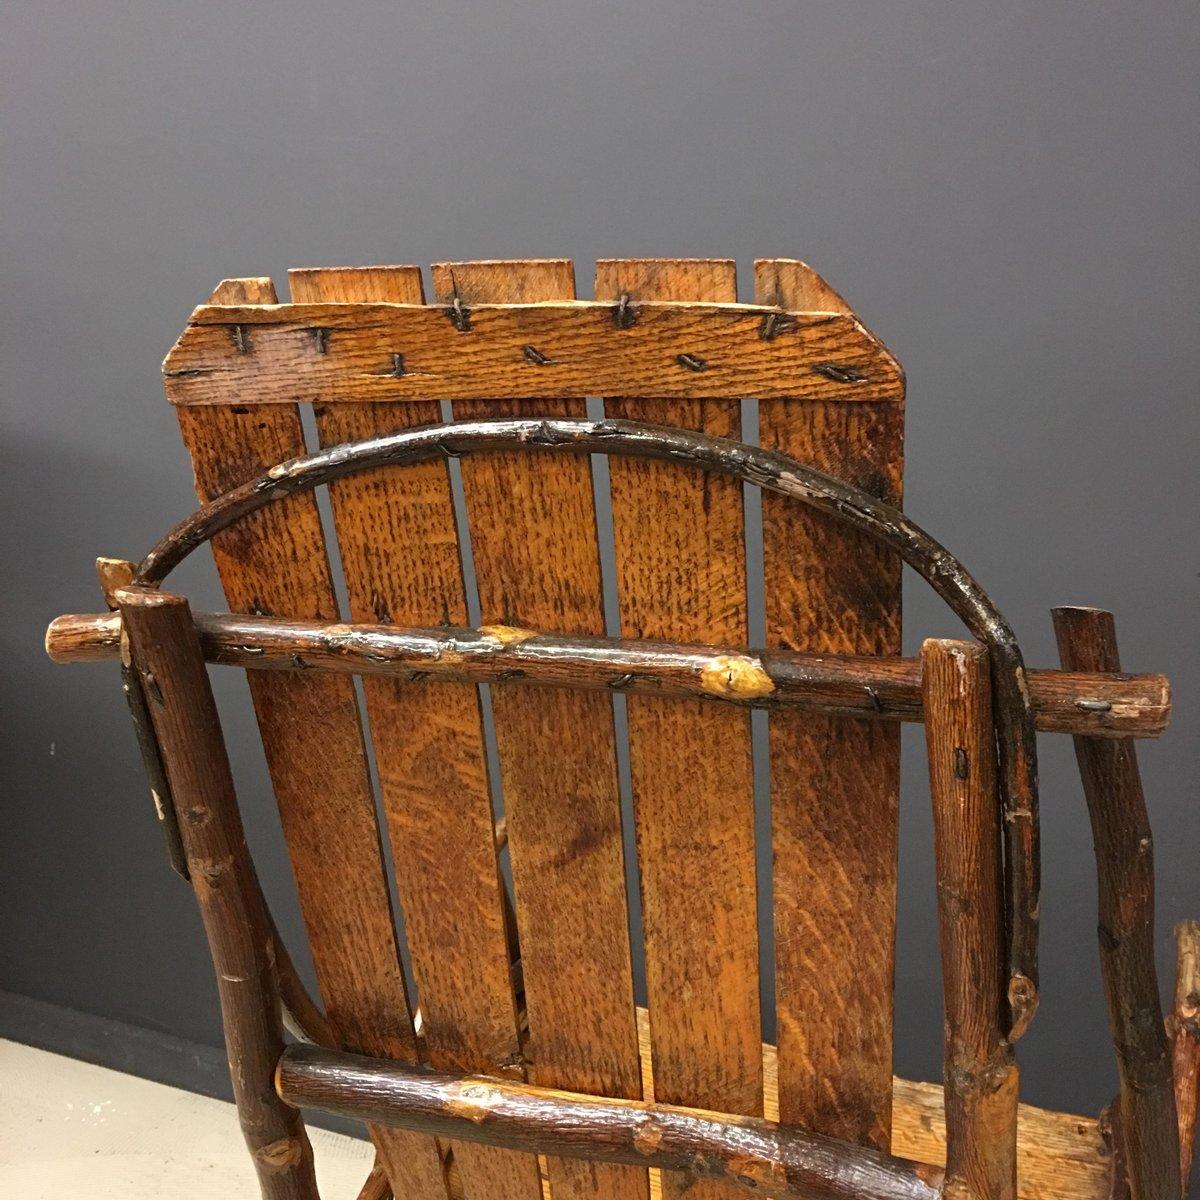 amerikanischer vintage adirondack schaukelstuhl bei pamono. Black Bedroom Furniture Sets. Home Design Ideas